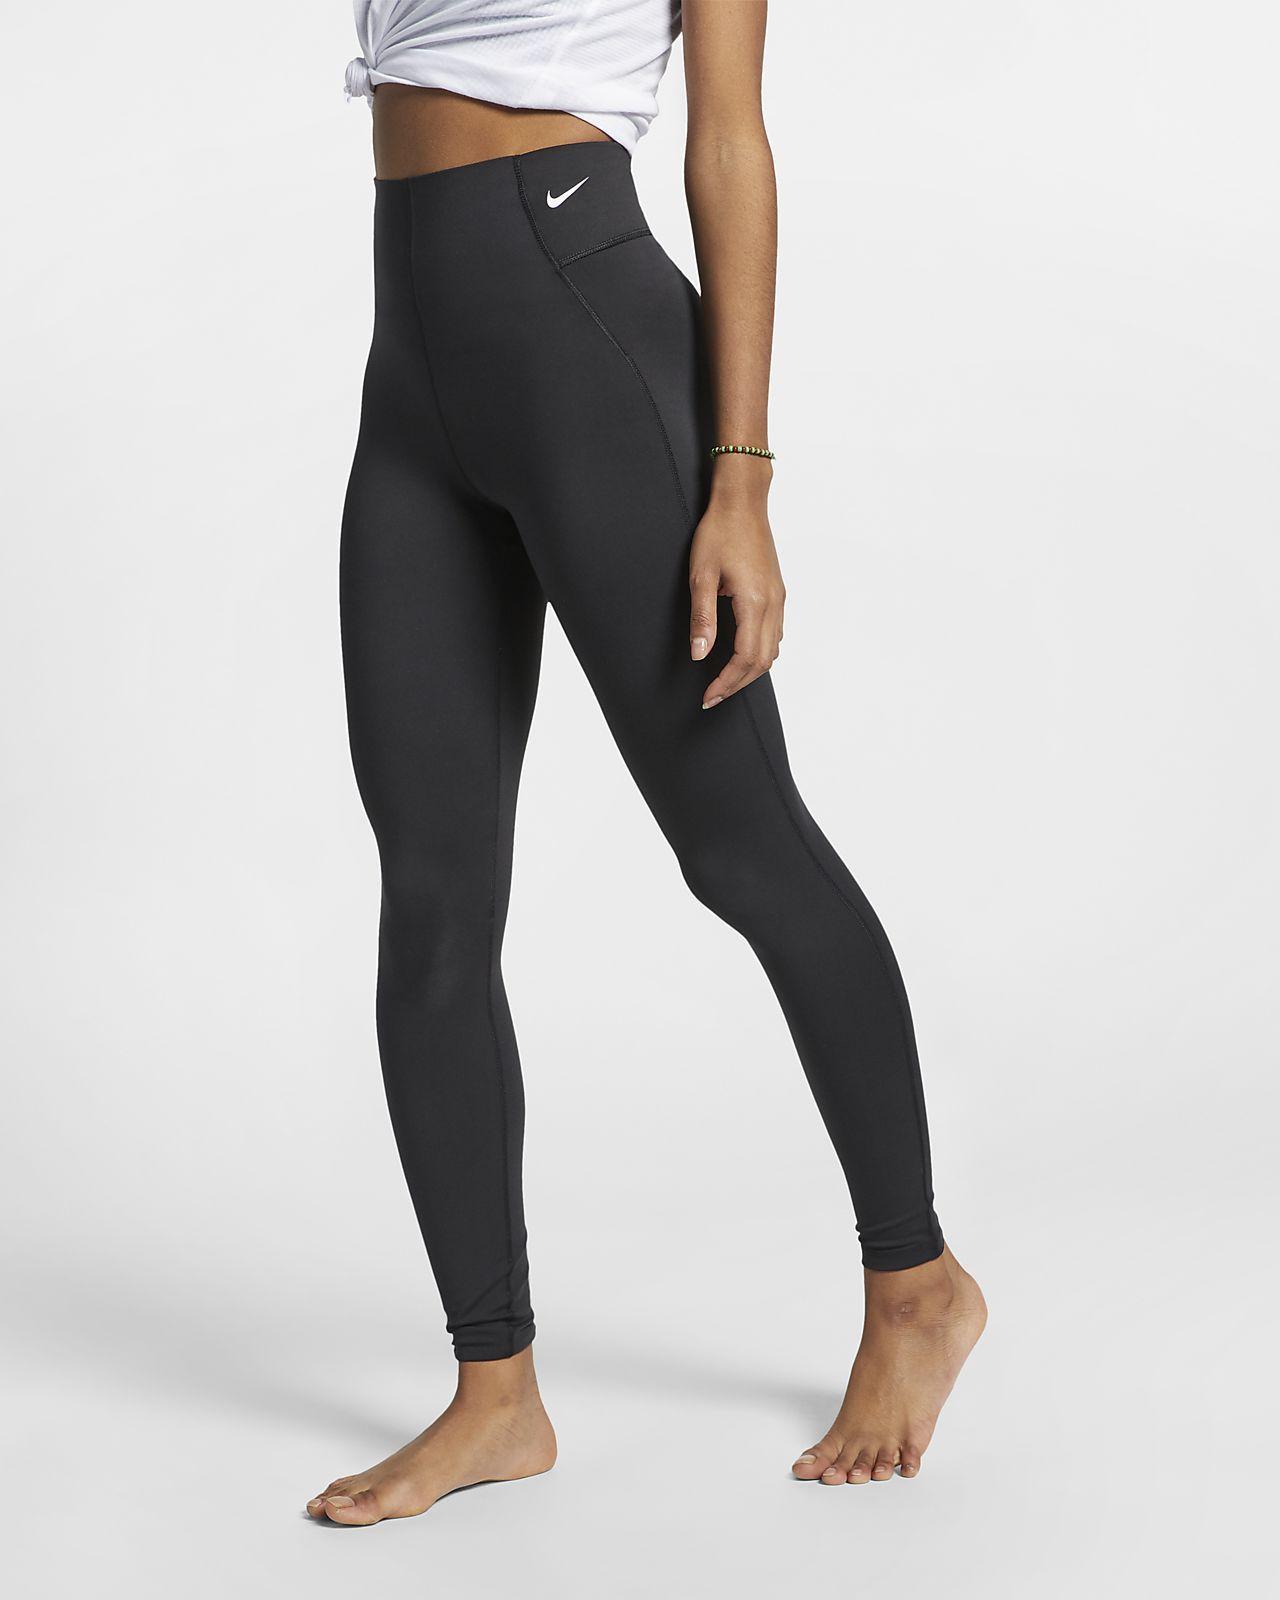 f9420b639061da Nike Women's Yoga Training Tights Victory in 2019 ...